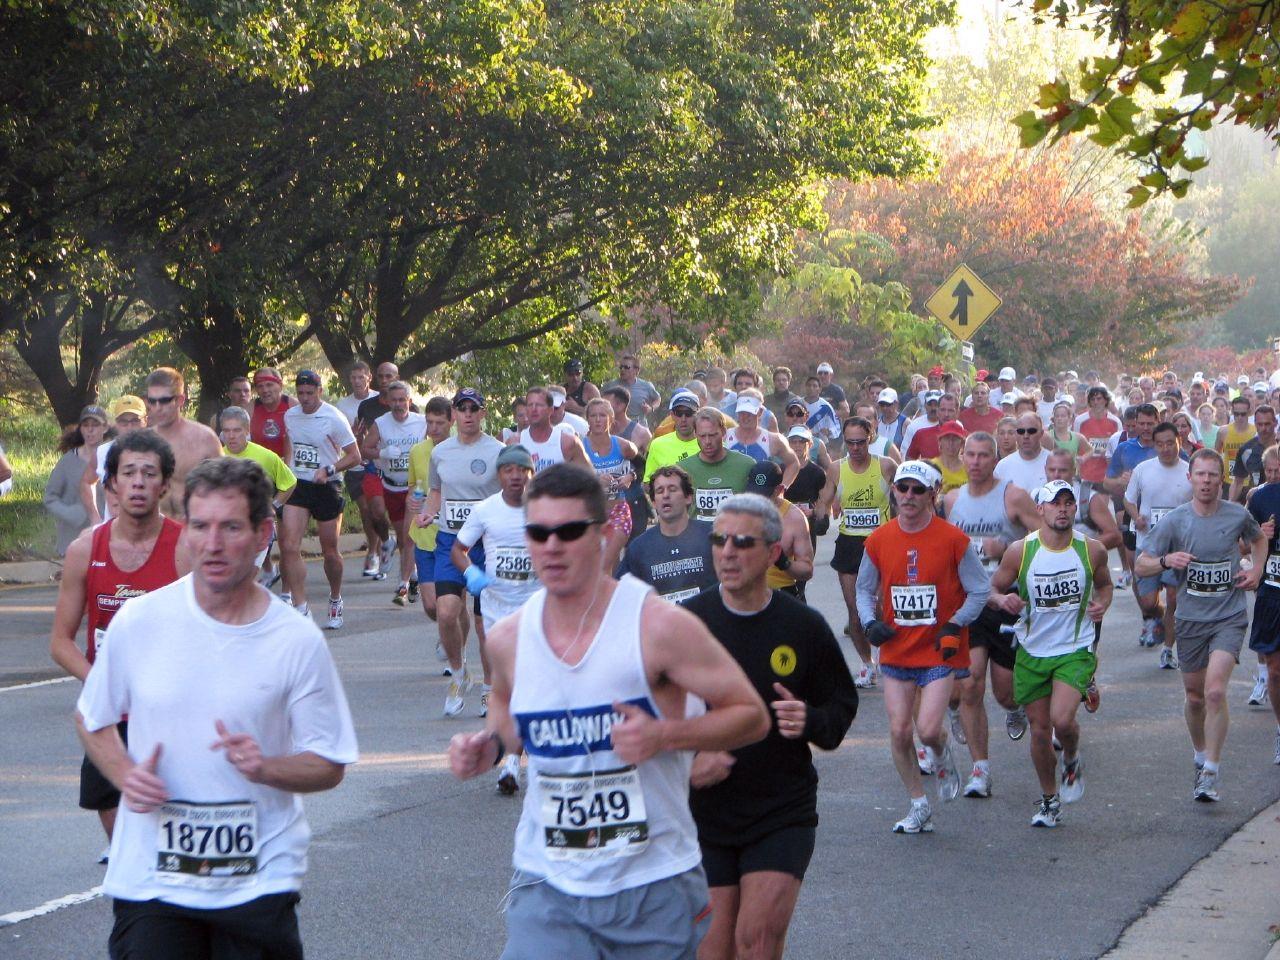 Marine Corps Marathon route